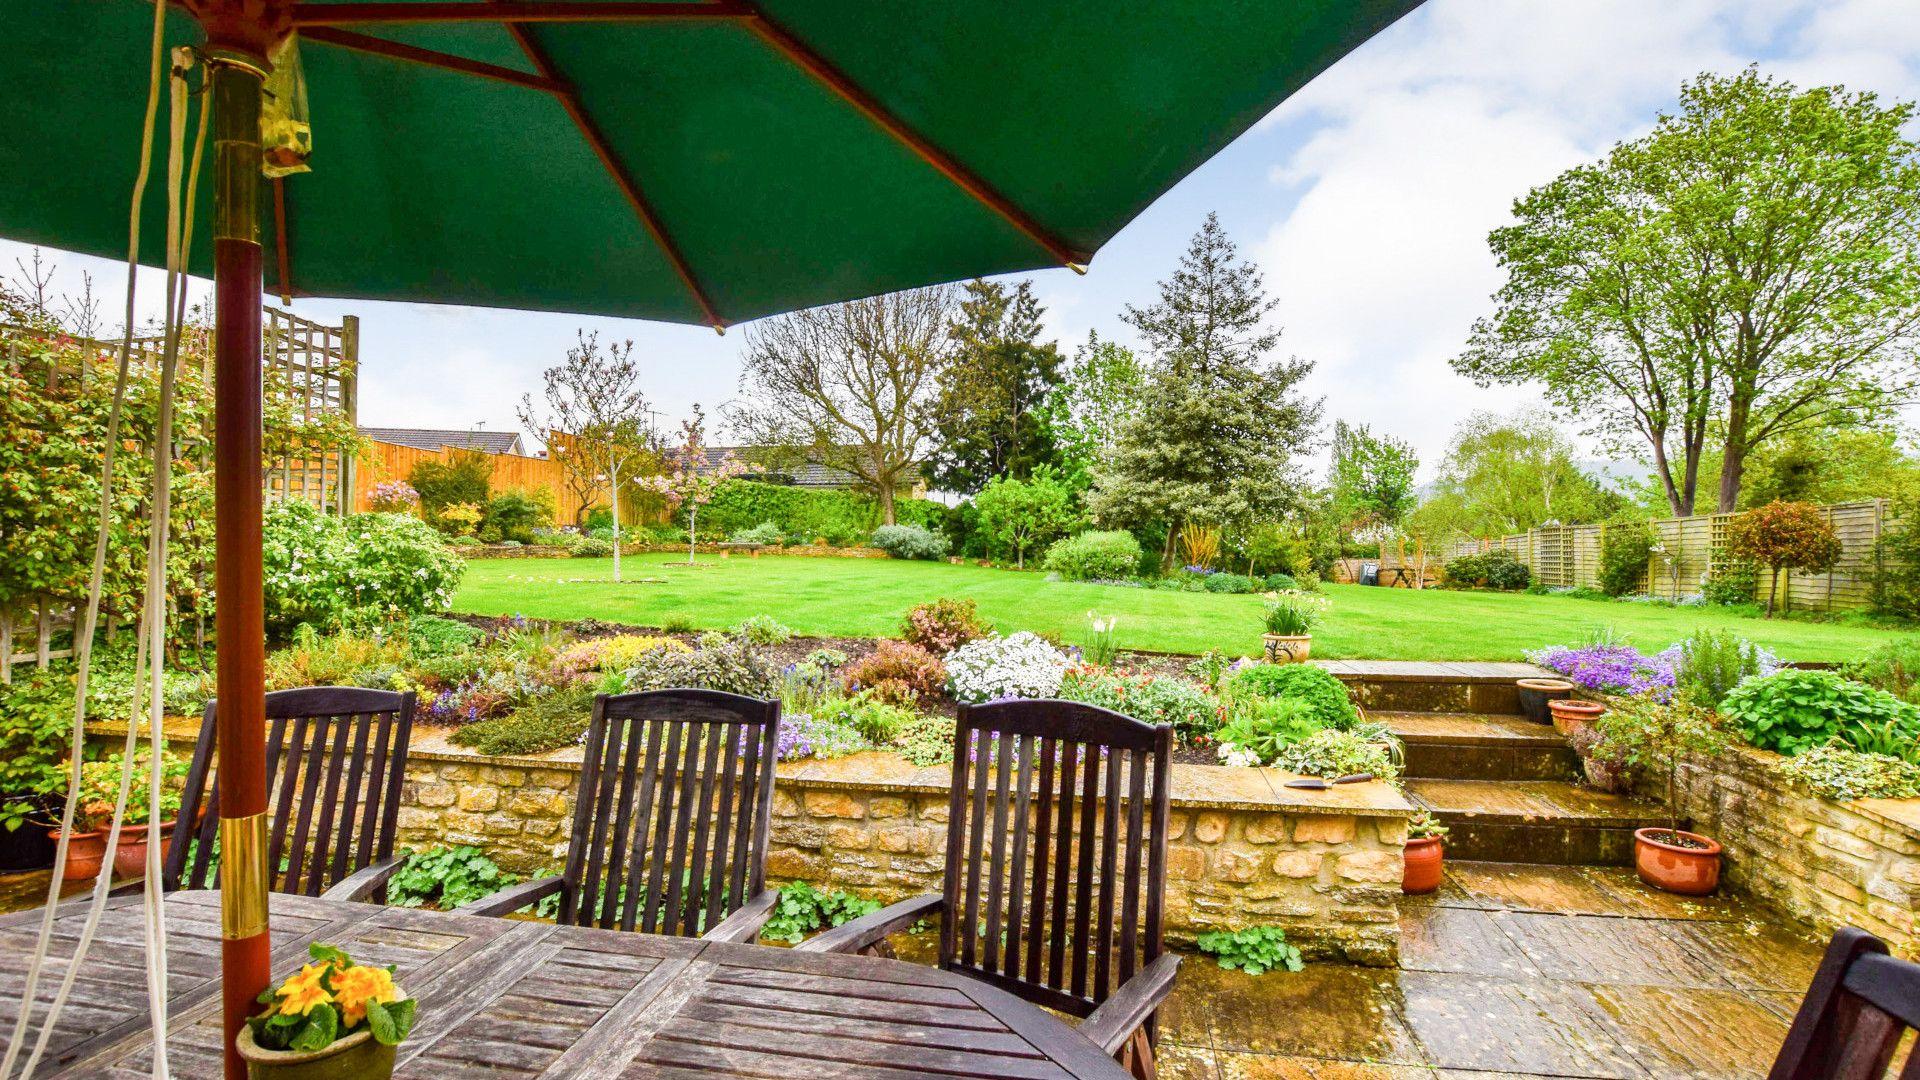 Patio with table and seating, Barebones Farm, Bolthole Retreats